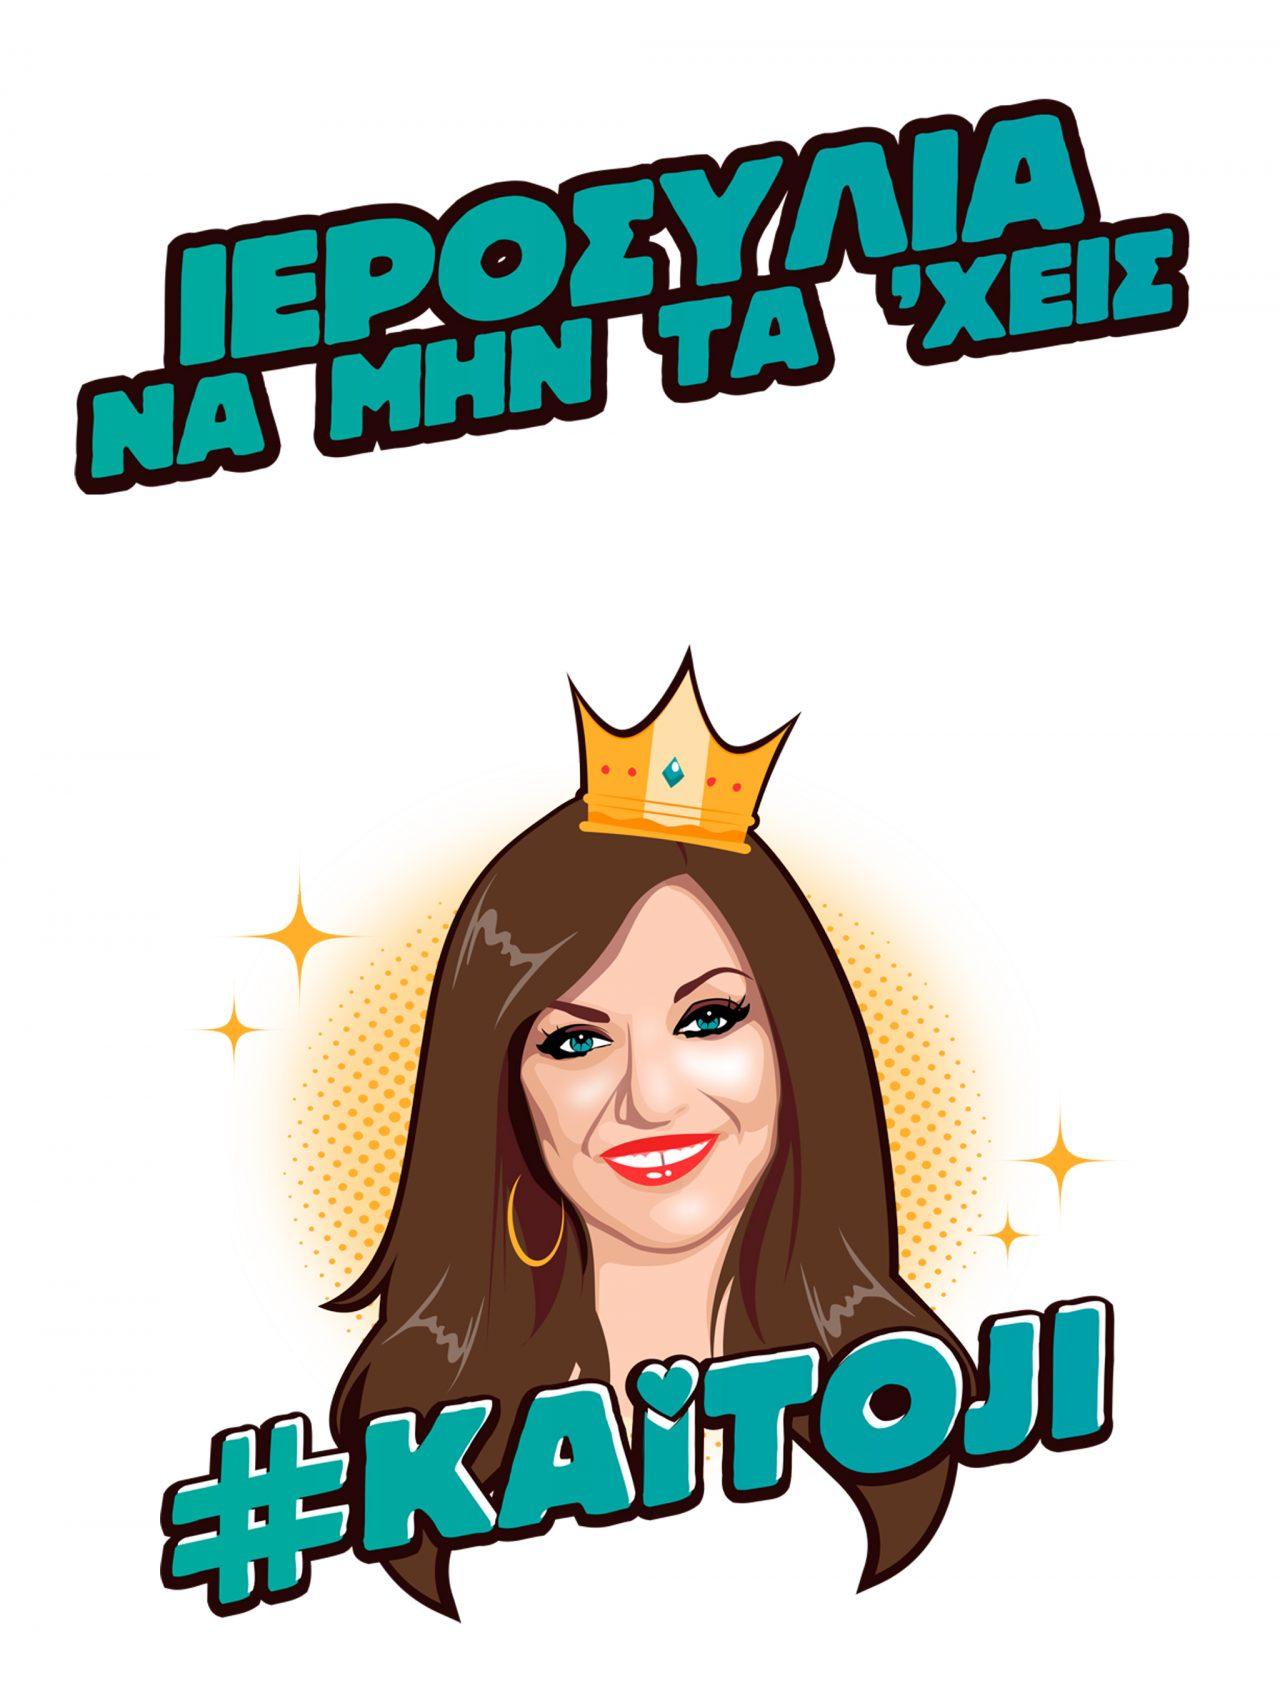 #Kaitoji